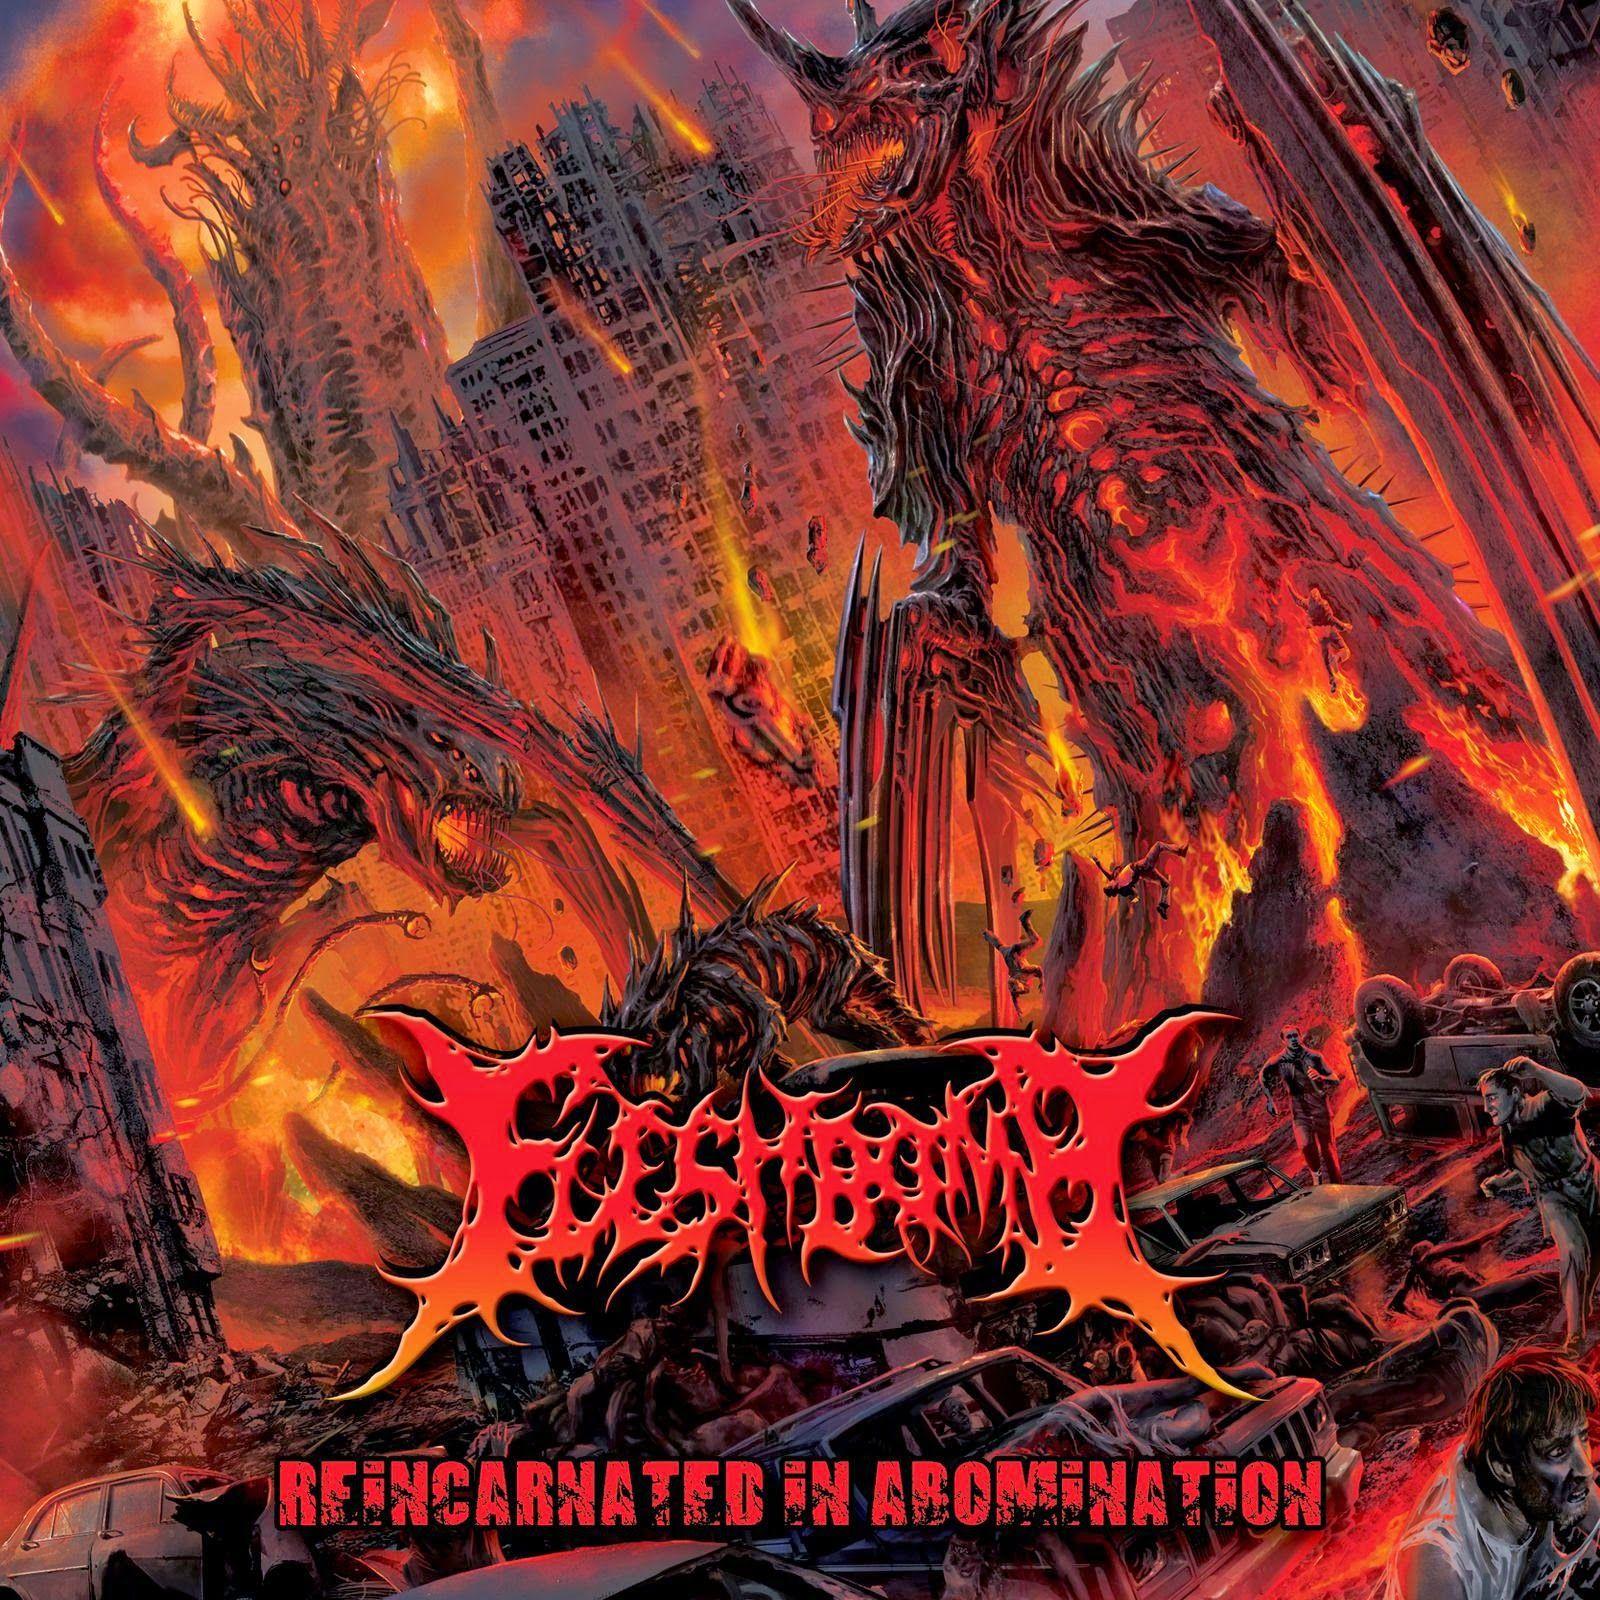 brutal thrash